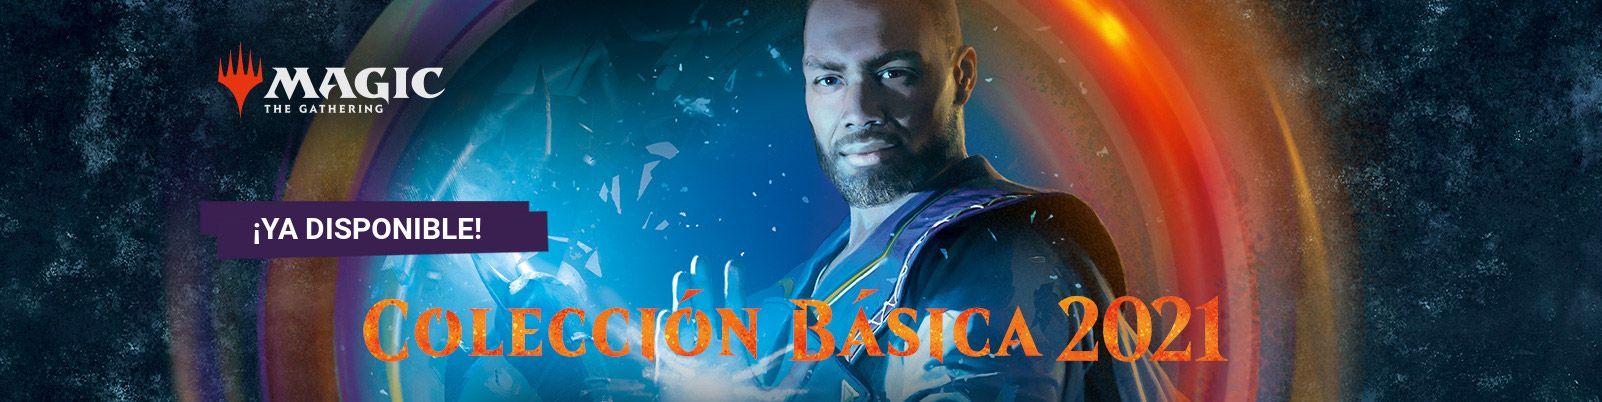 MTG Colección Básica 2021- Banner 2